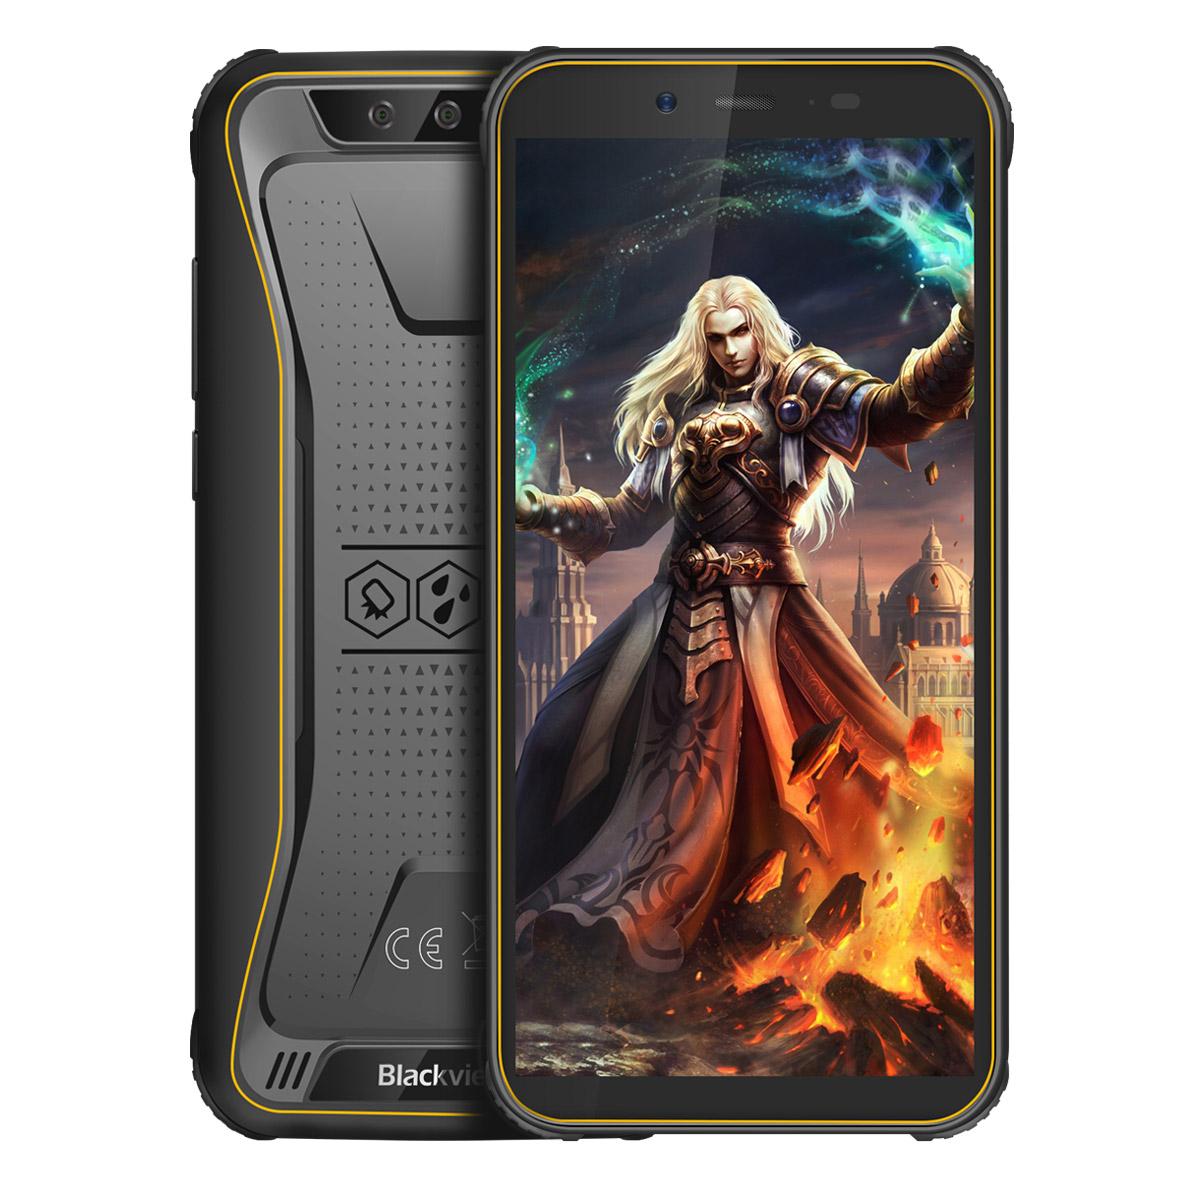 "Smartphone 5.5"" Blackview BV5500 Pro - HD+, MT6739, 3 Go de RAM, 16 Go, étanche IP68 / IP69K (Blackview.hk)"